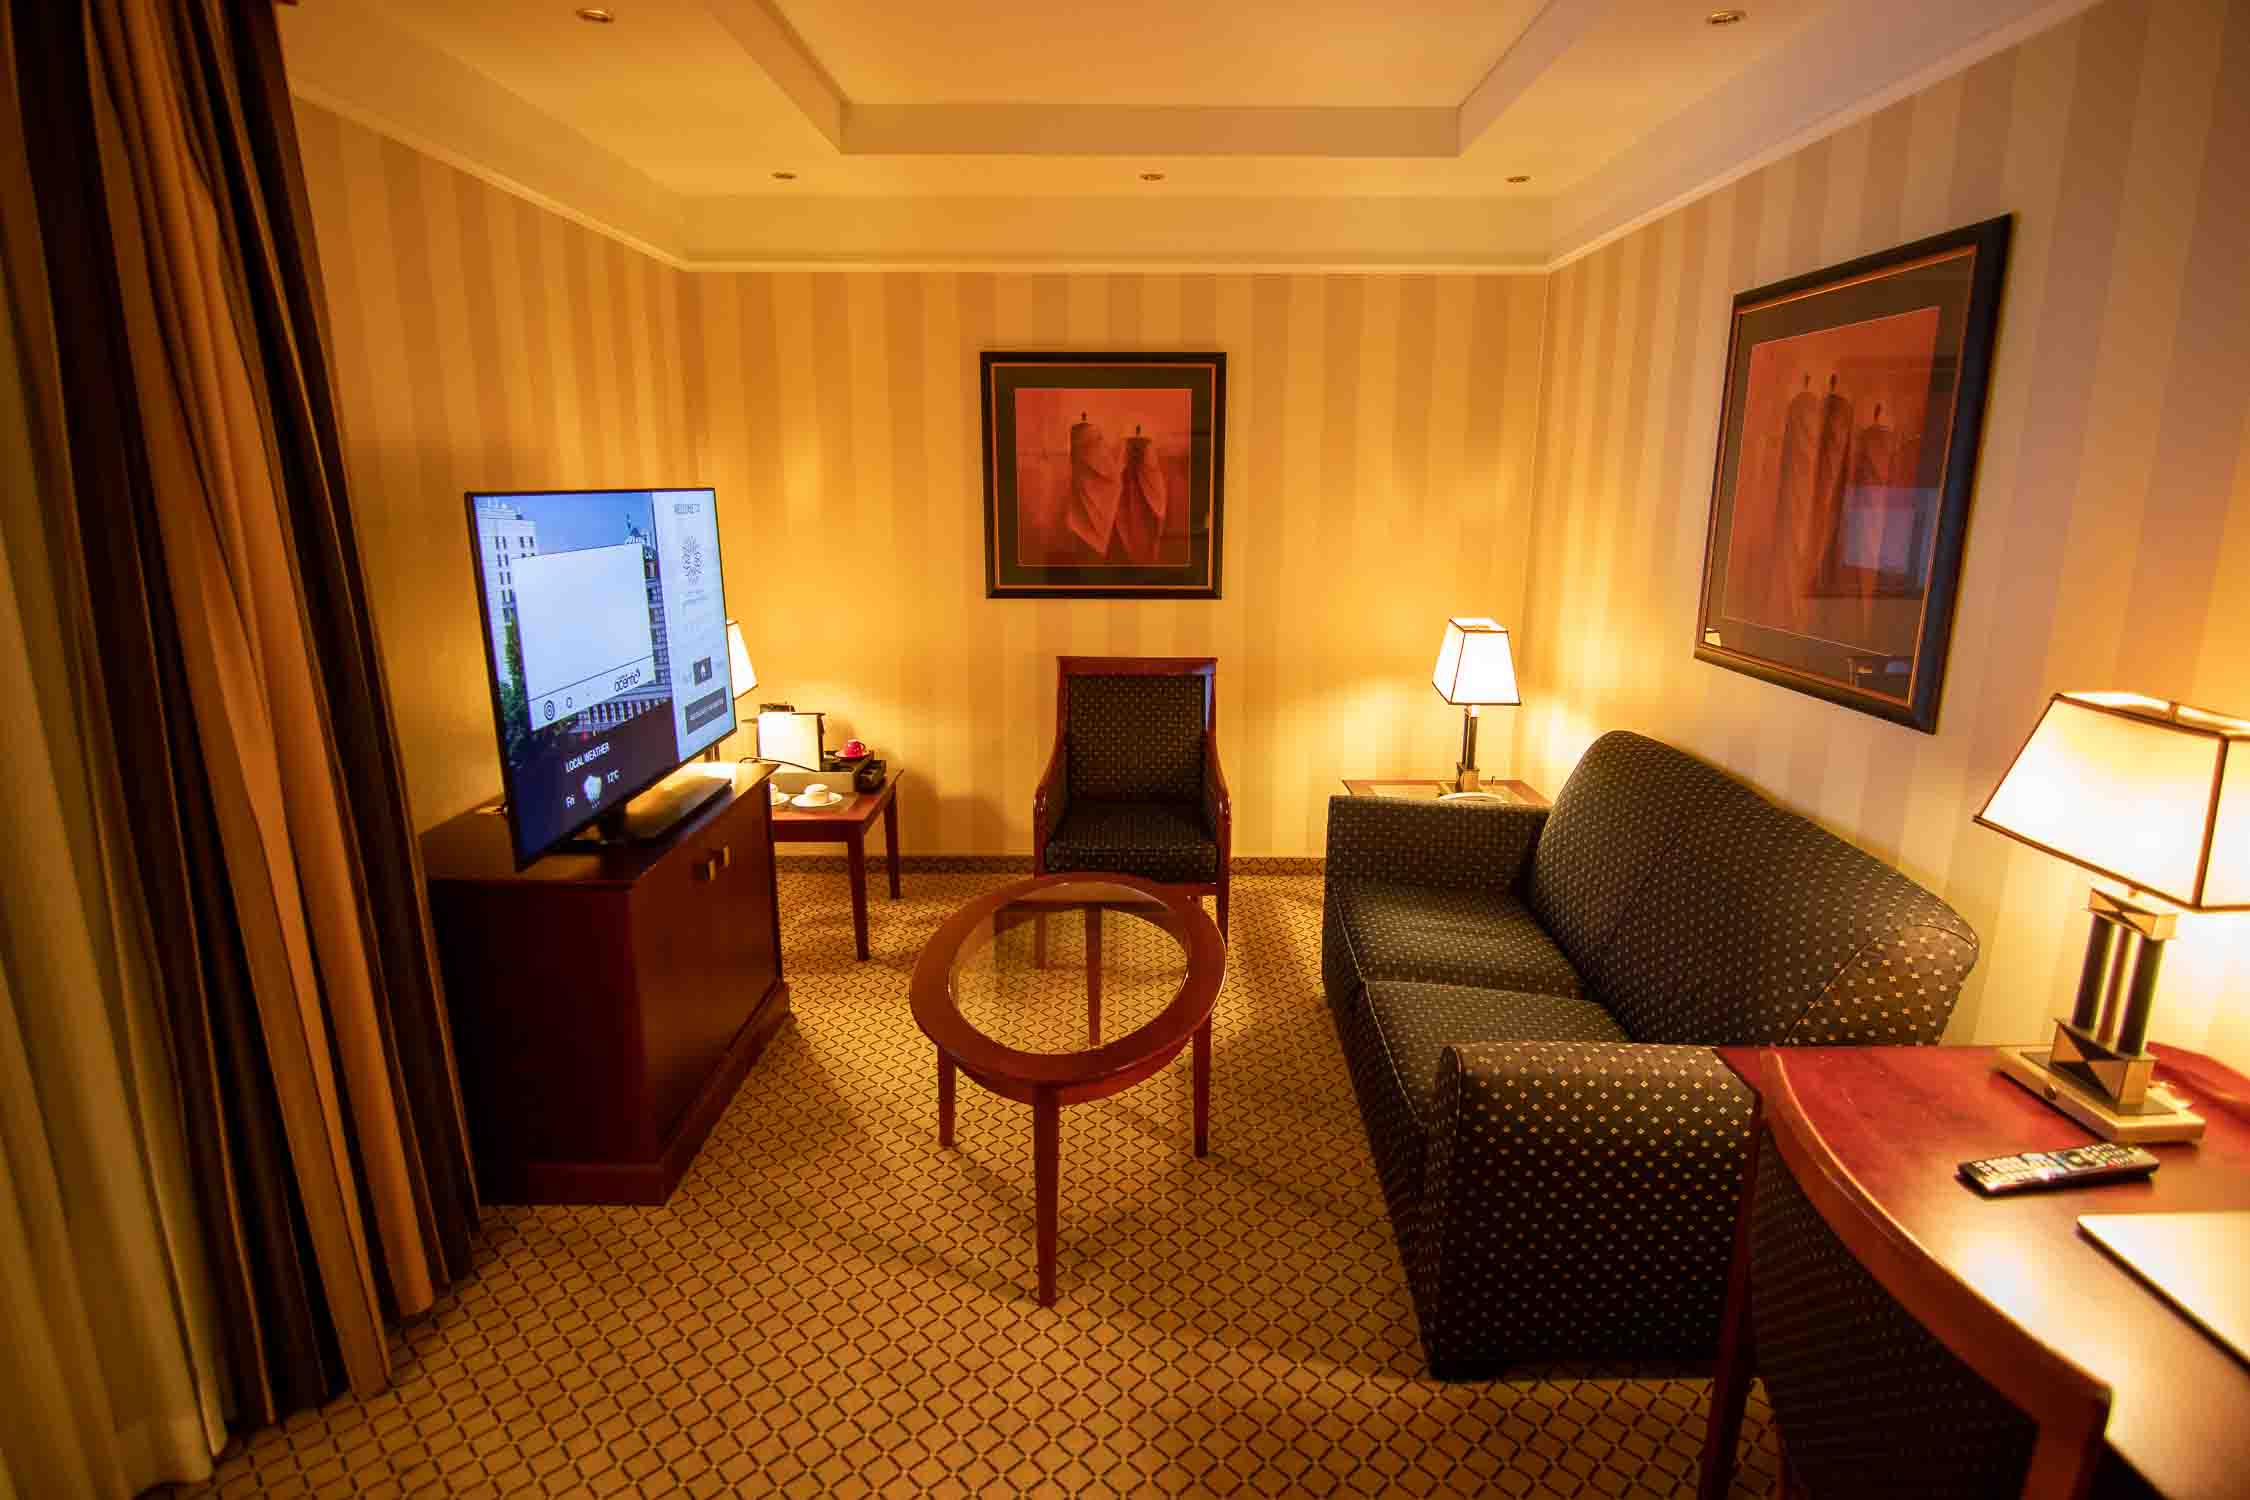 Executive Suite JW Marriott Hotel Berlin Erfahrungsbericht-3